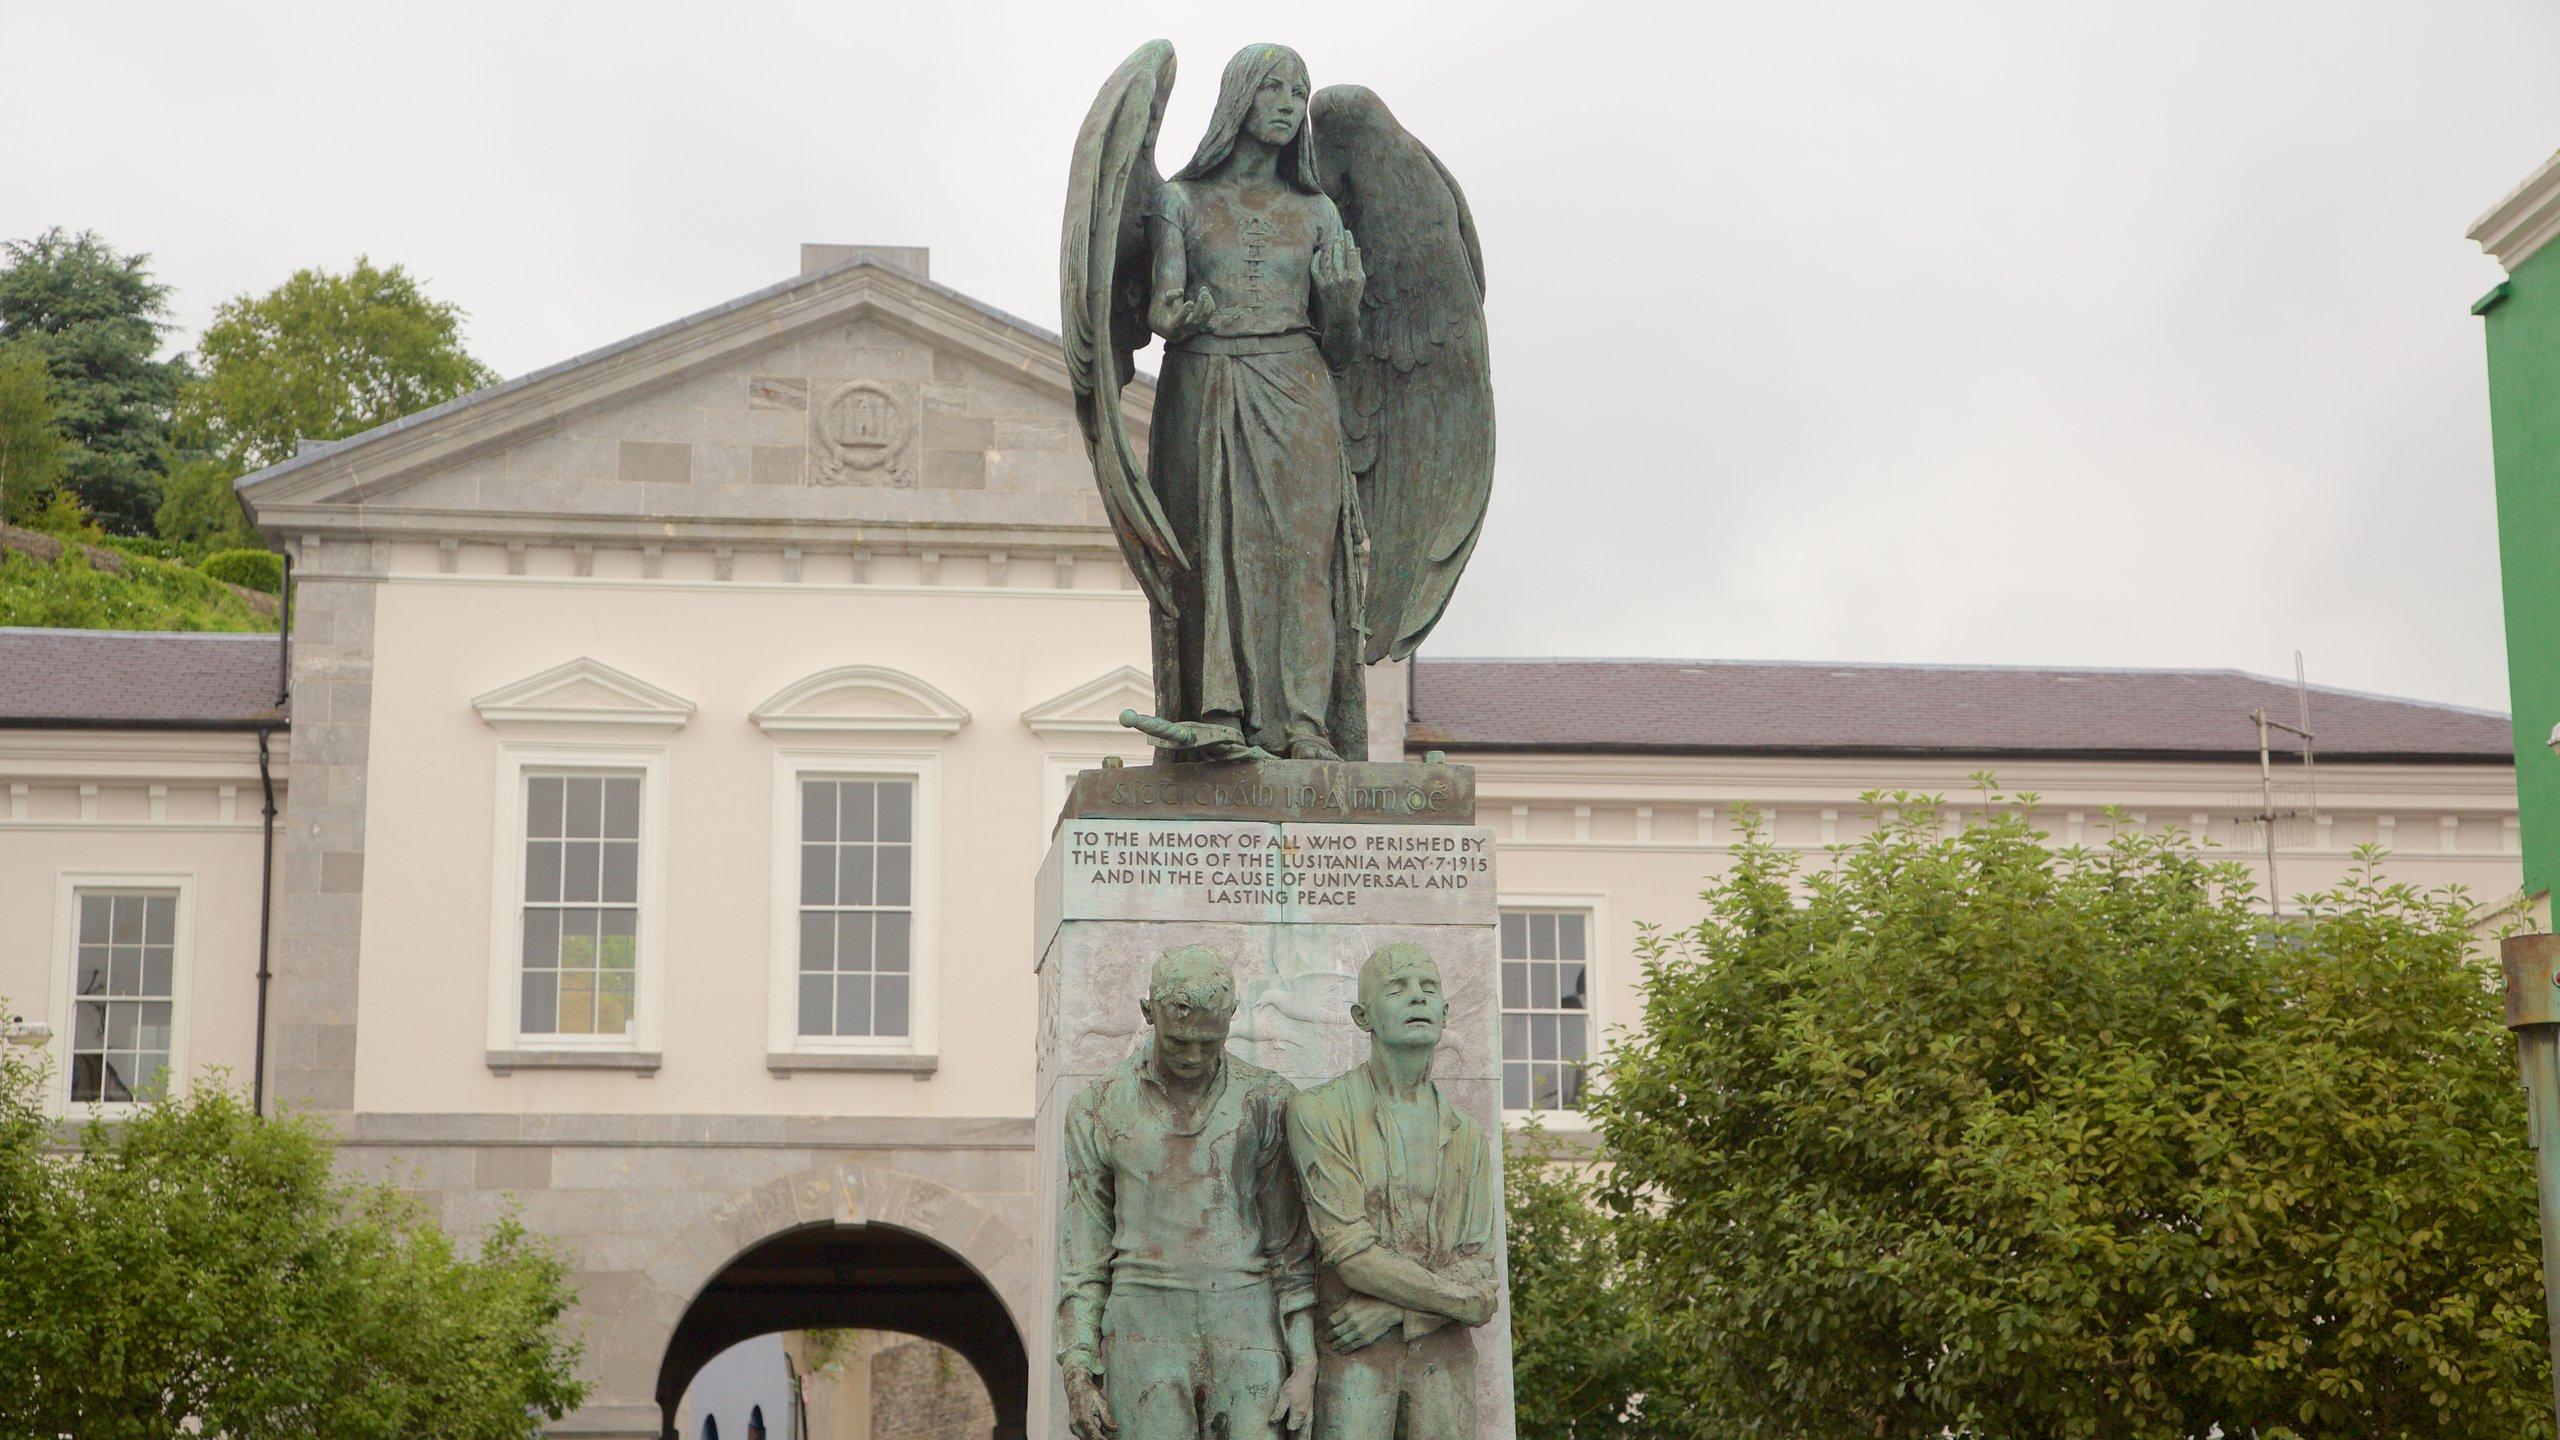 Lusitania Memorial, Cobh, Cork (graafschap), Ierland